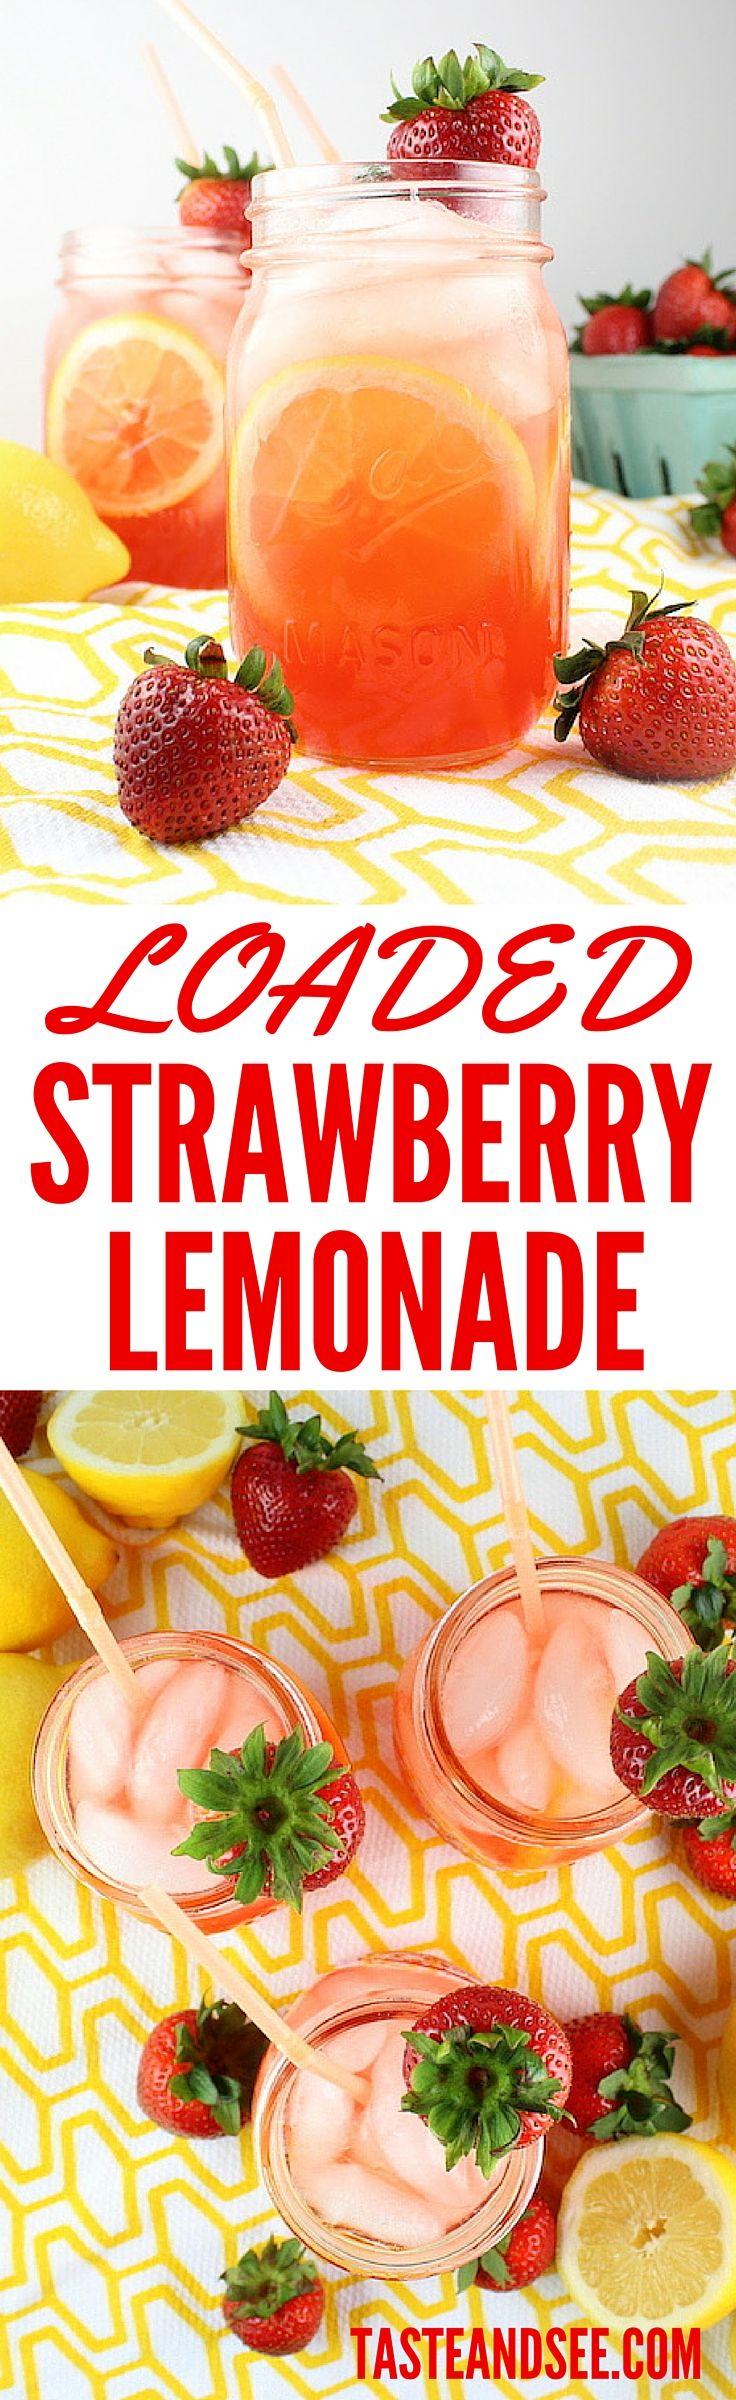 Loaded Strawberry Lemonade is the poster child for summer's ultimate cocktail: fresh lemon juice, strawberry liquor, vodka and fresh strawberries of course! #strawberrylemonade http://tasteandsee.com